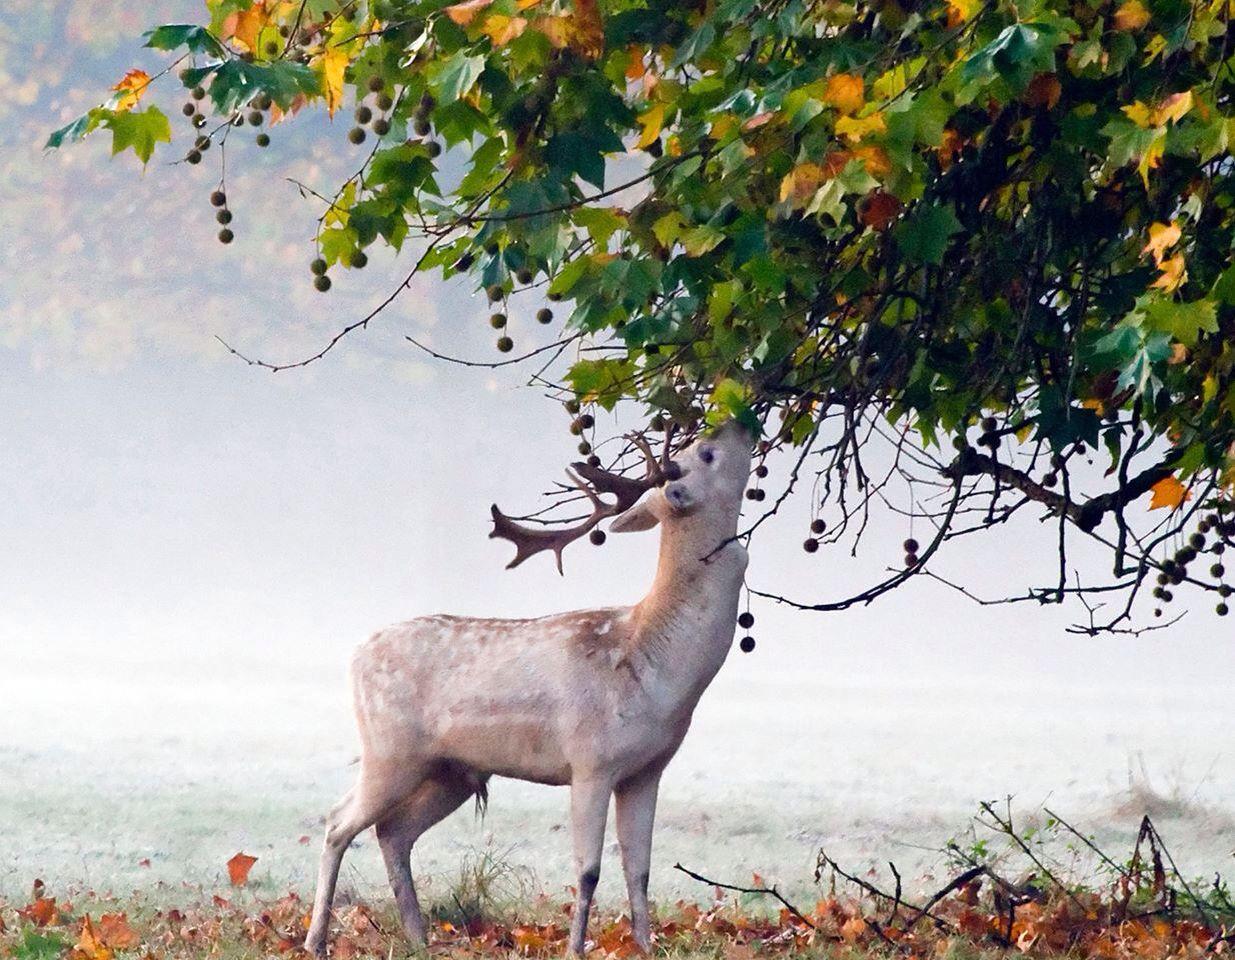 White stag in Oxford